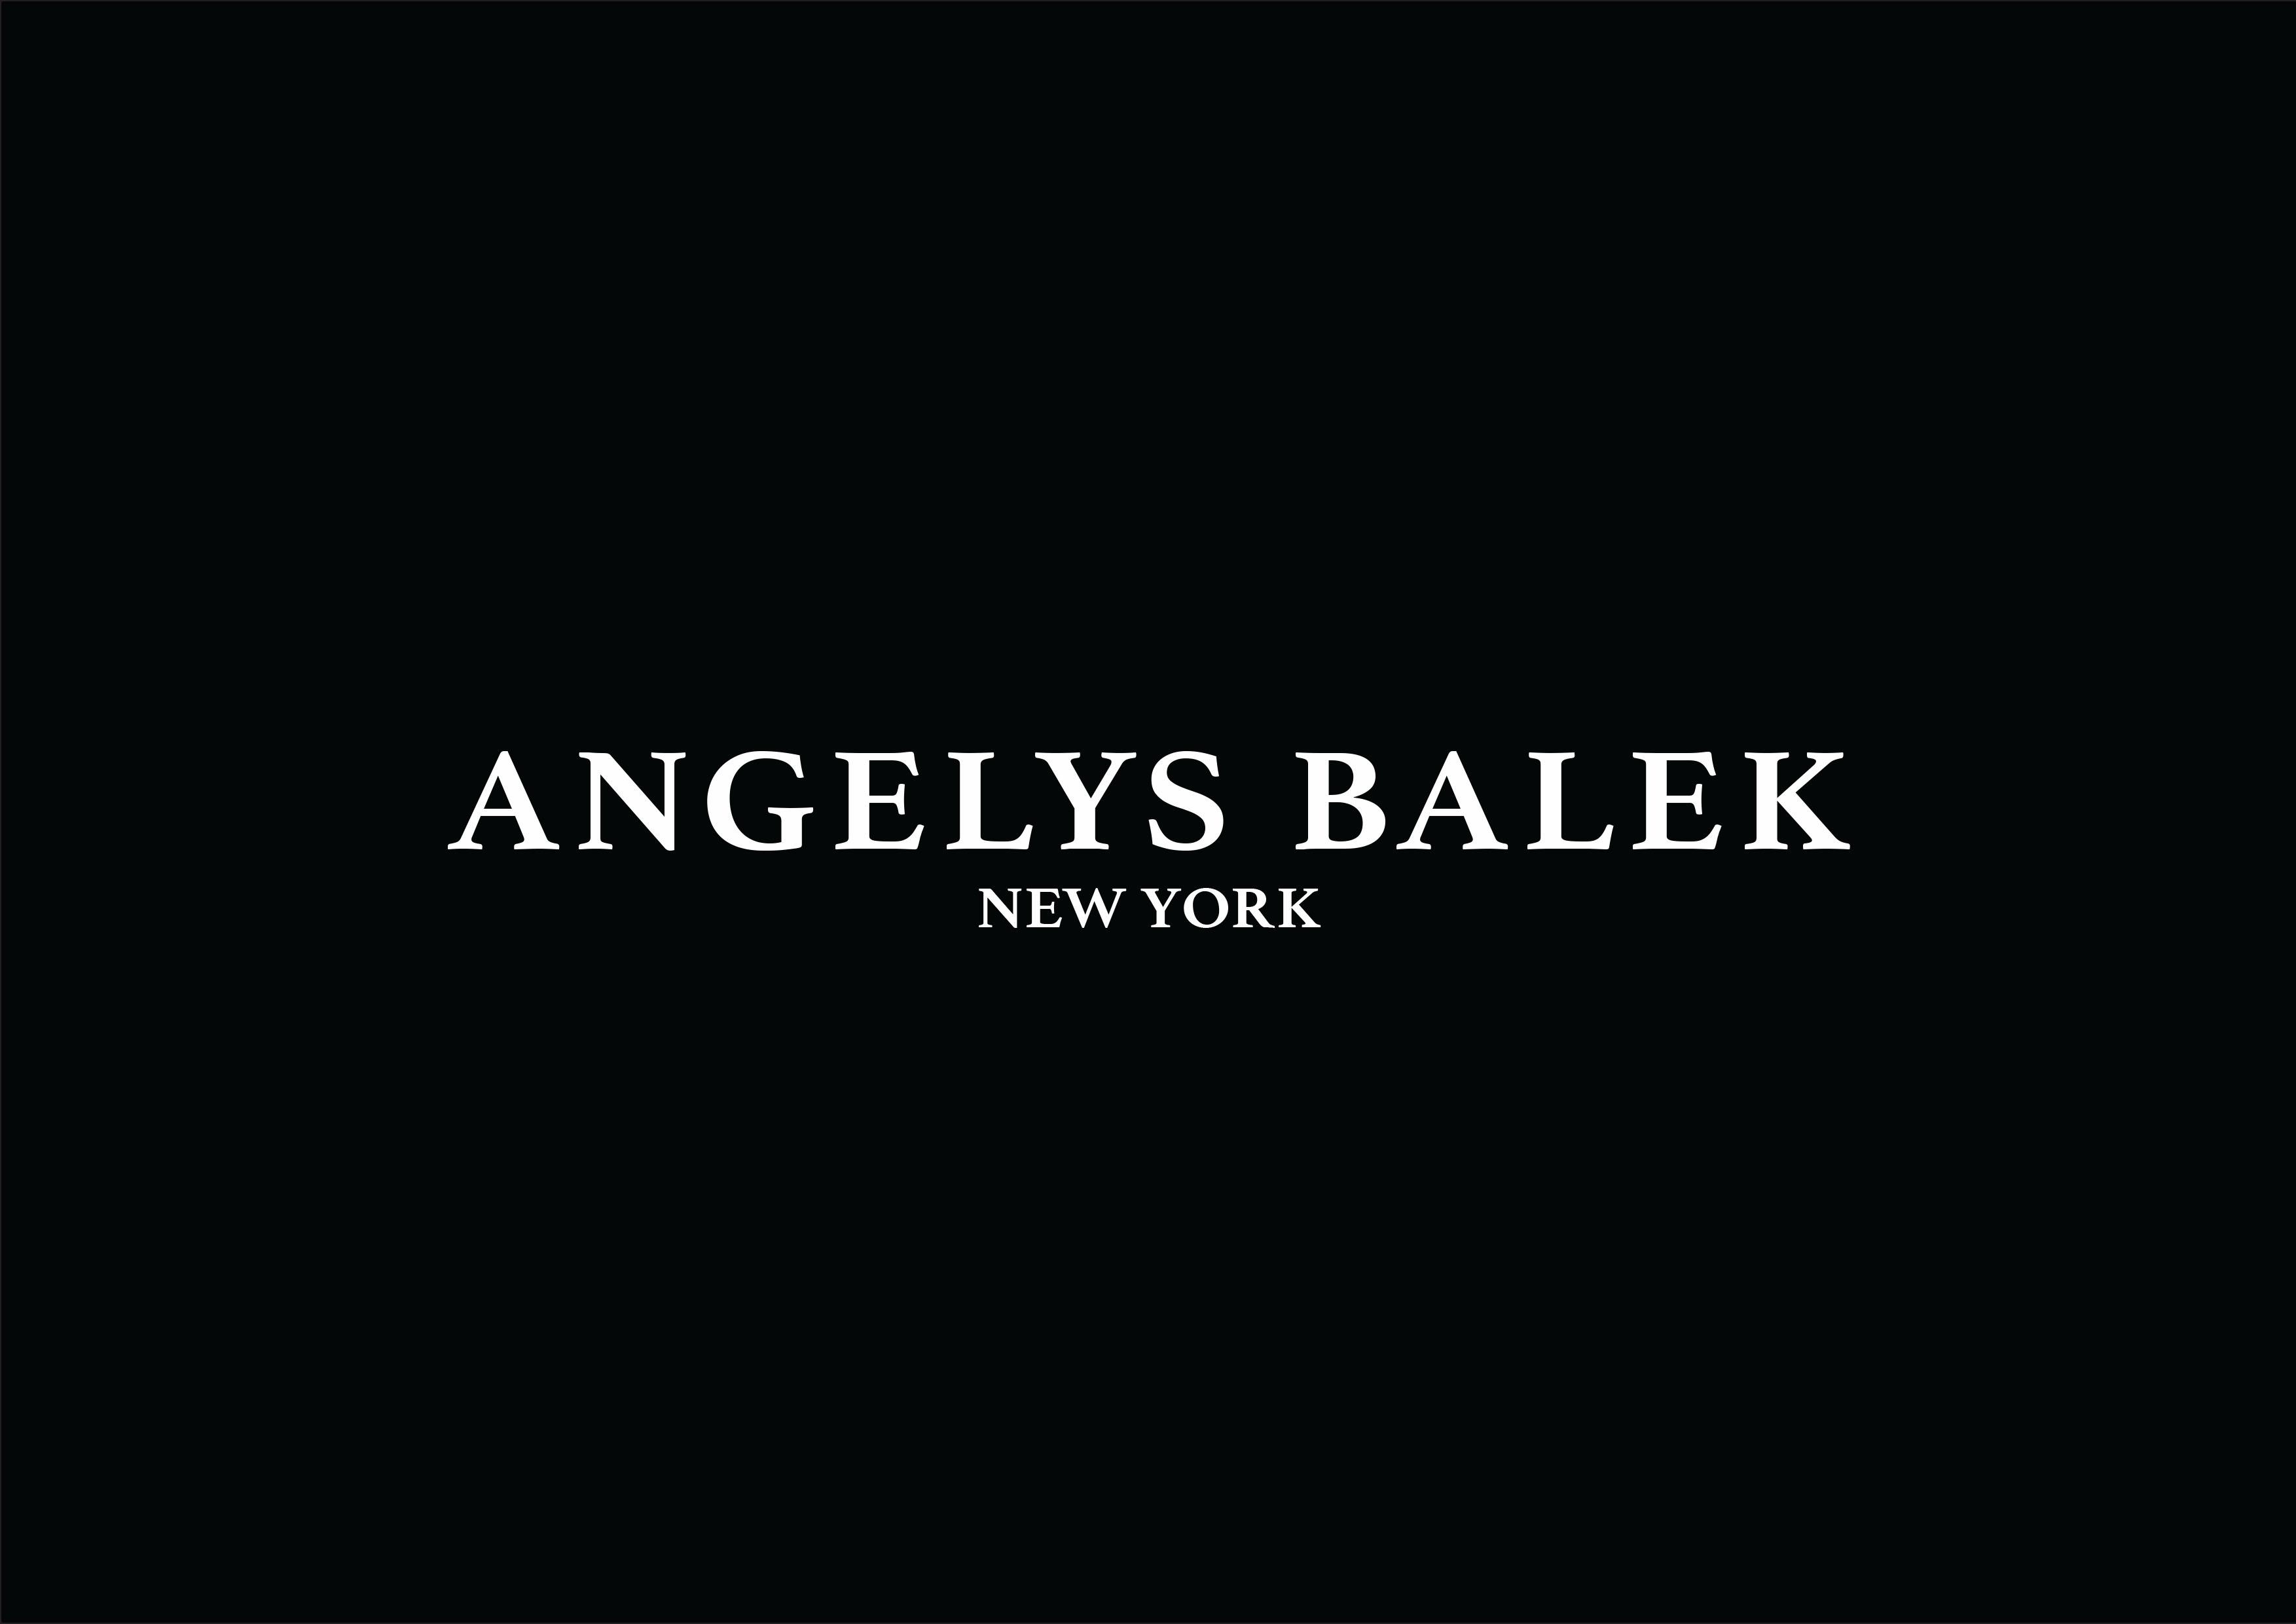 Angelys Balek New York, LLC's Logo